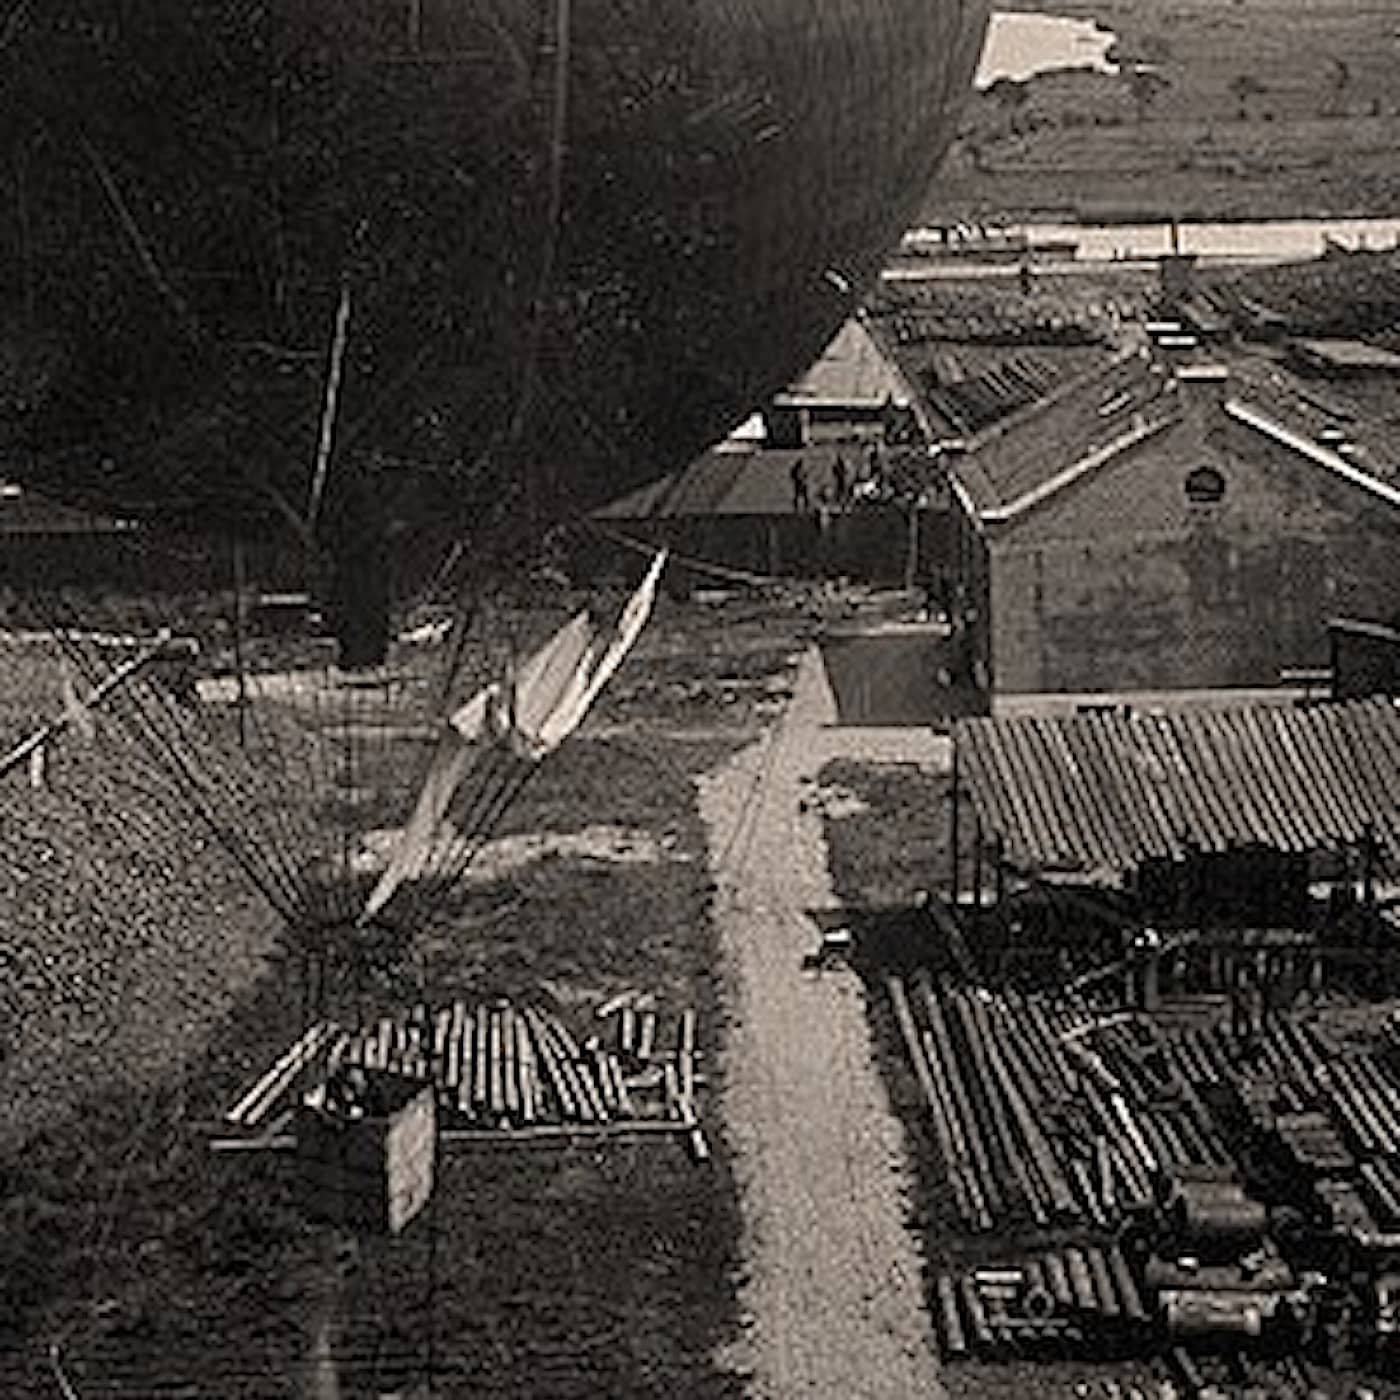 Andrées galna ballongflygningar